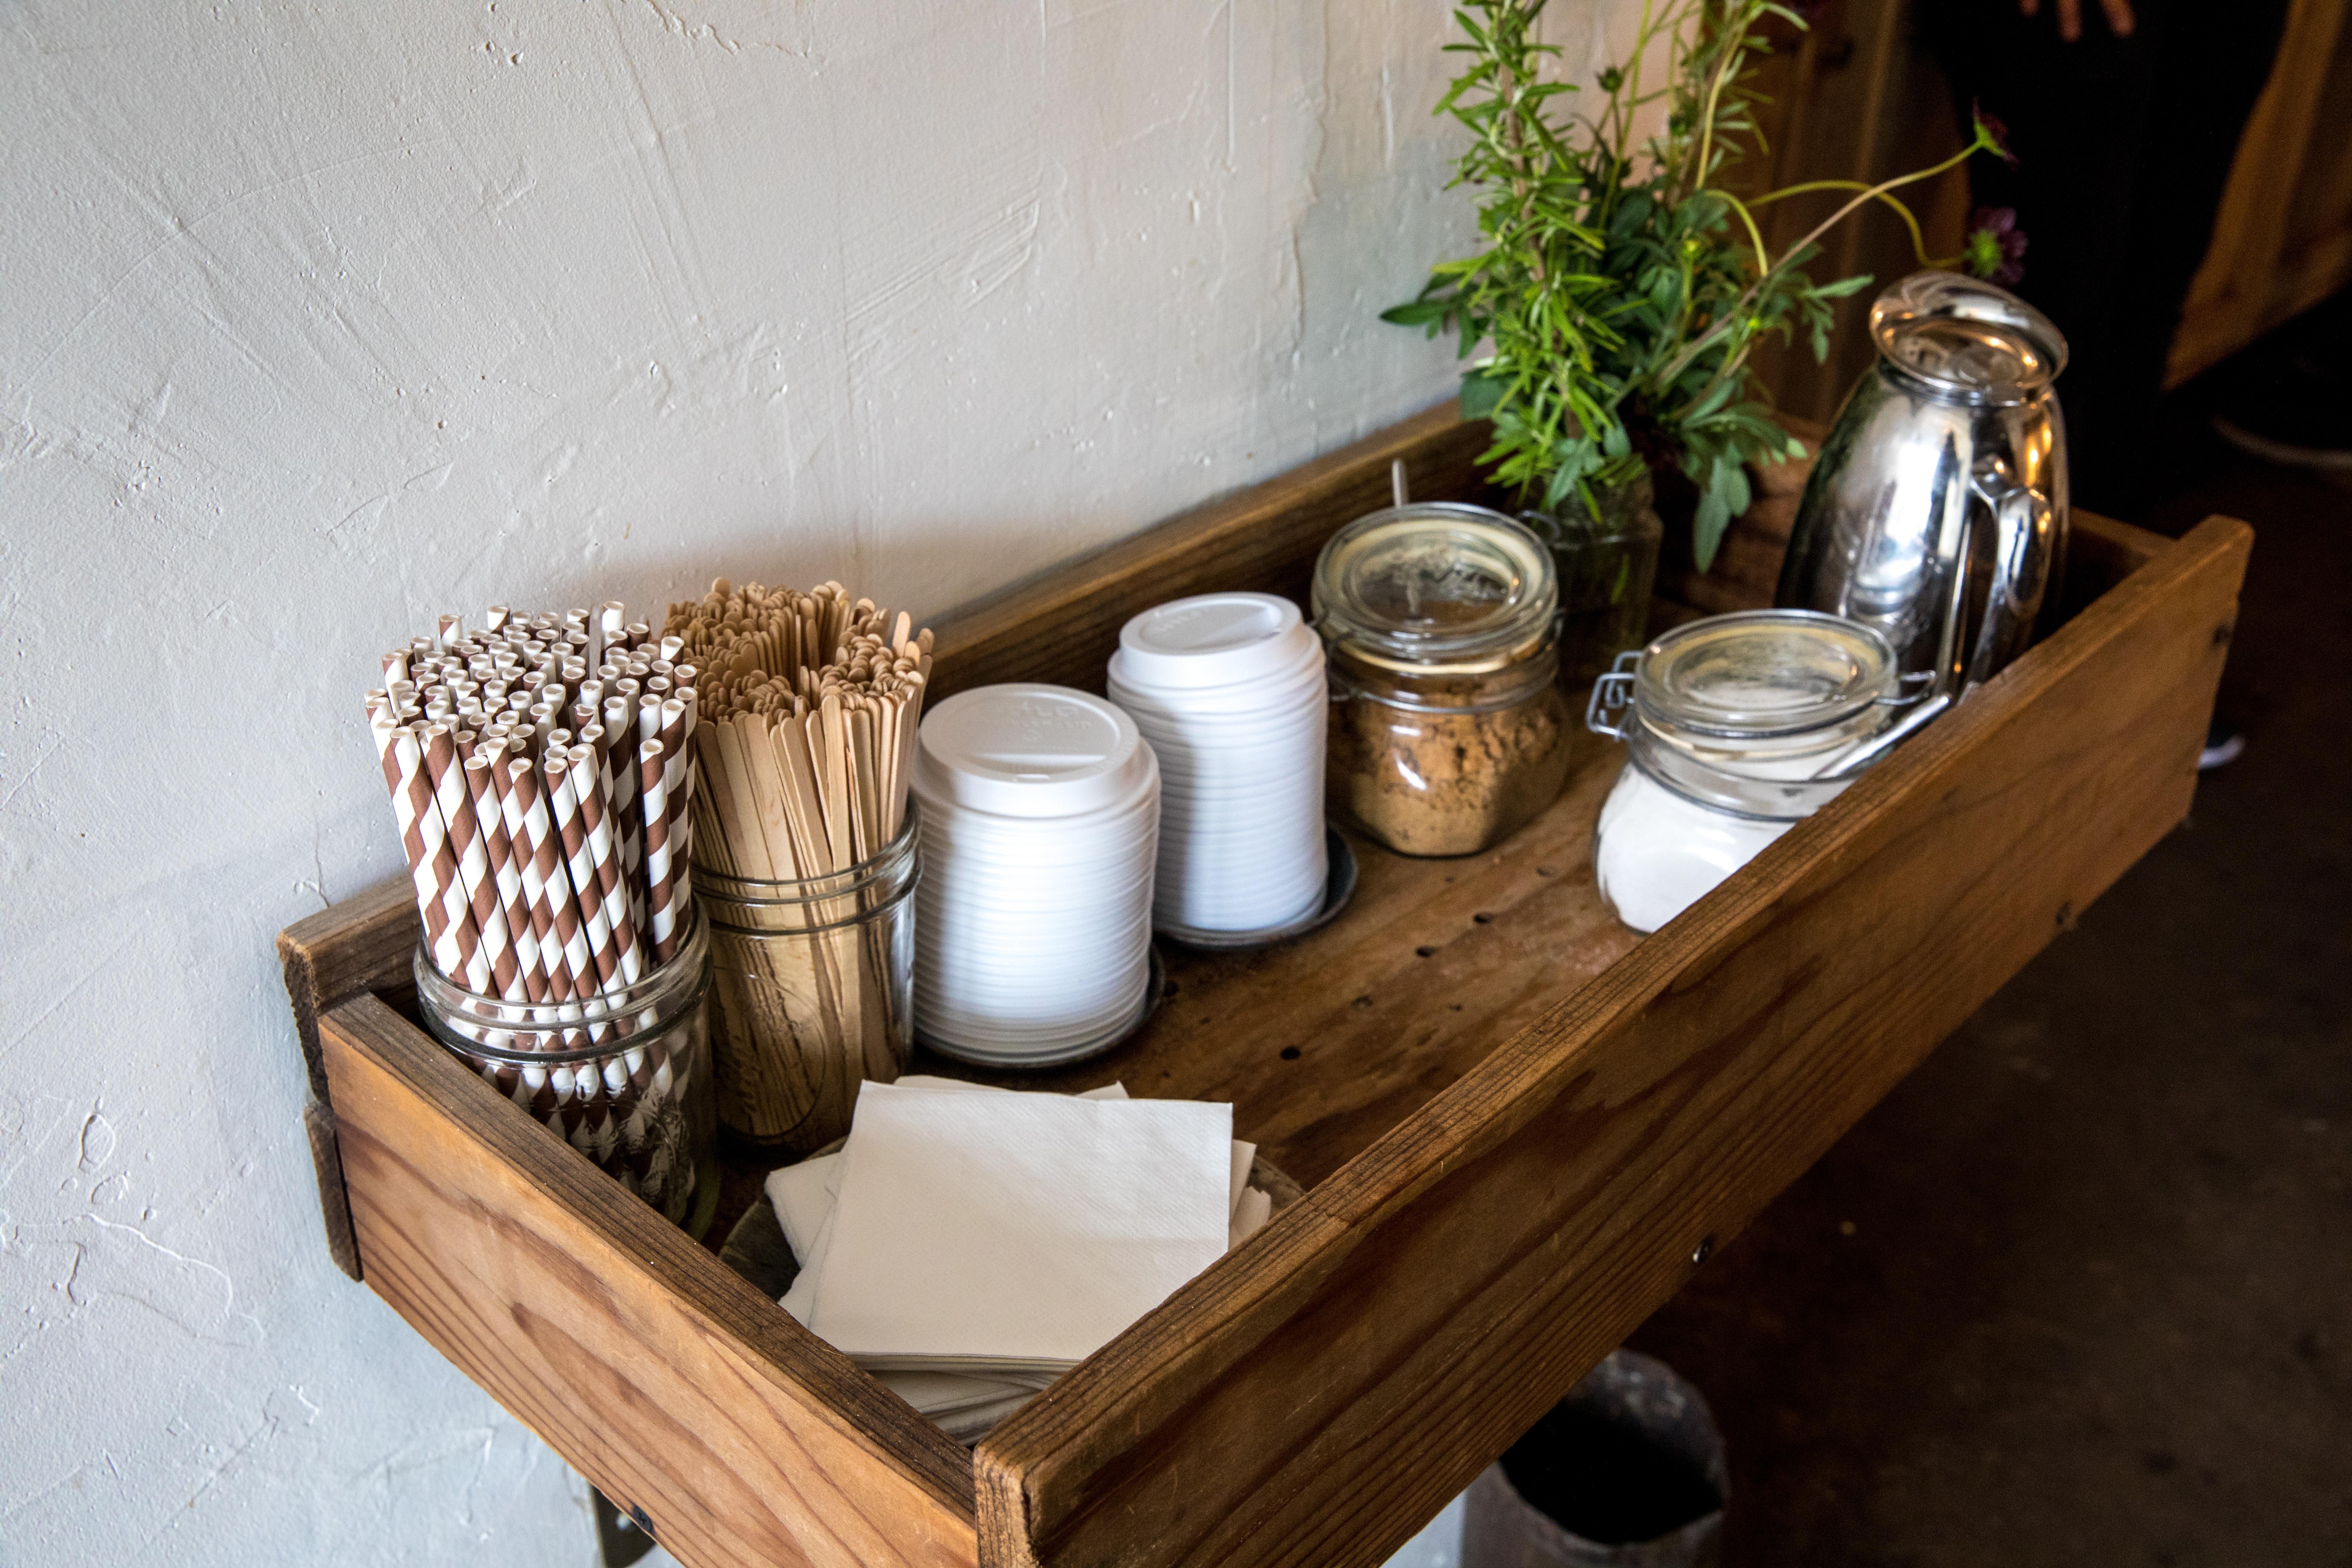 wafer sticks inside glass jar on top of rack